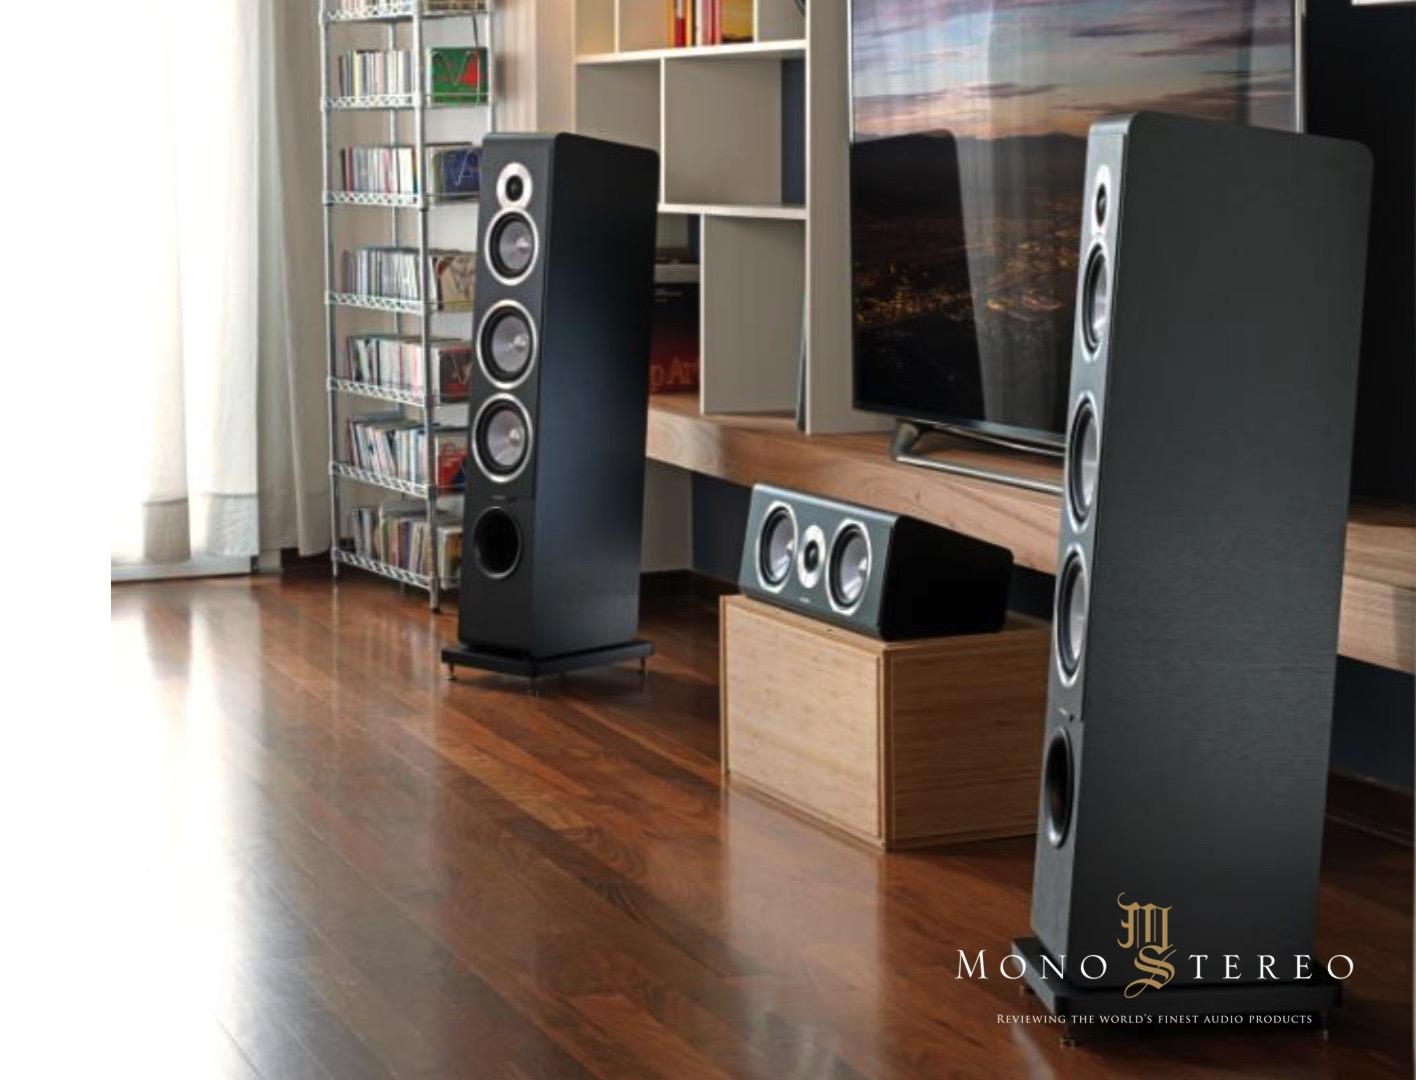 Mono and Stereo High-End Audio Magazine: Sonus faber